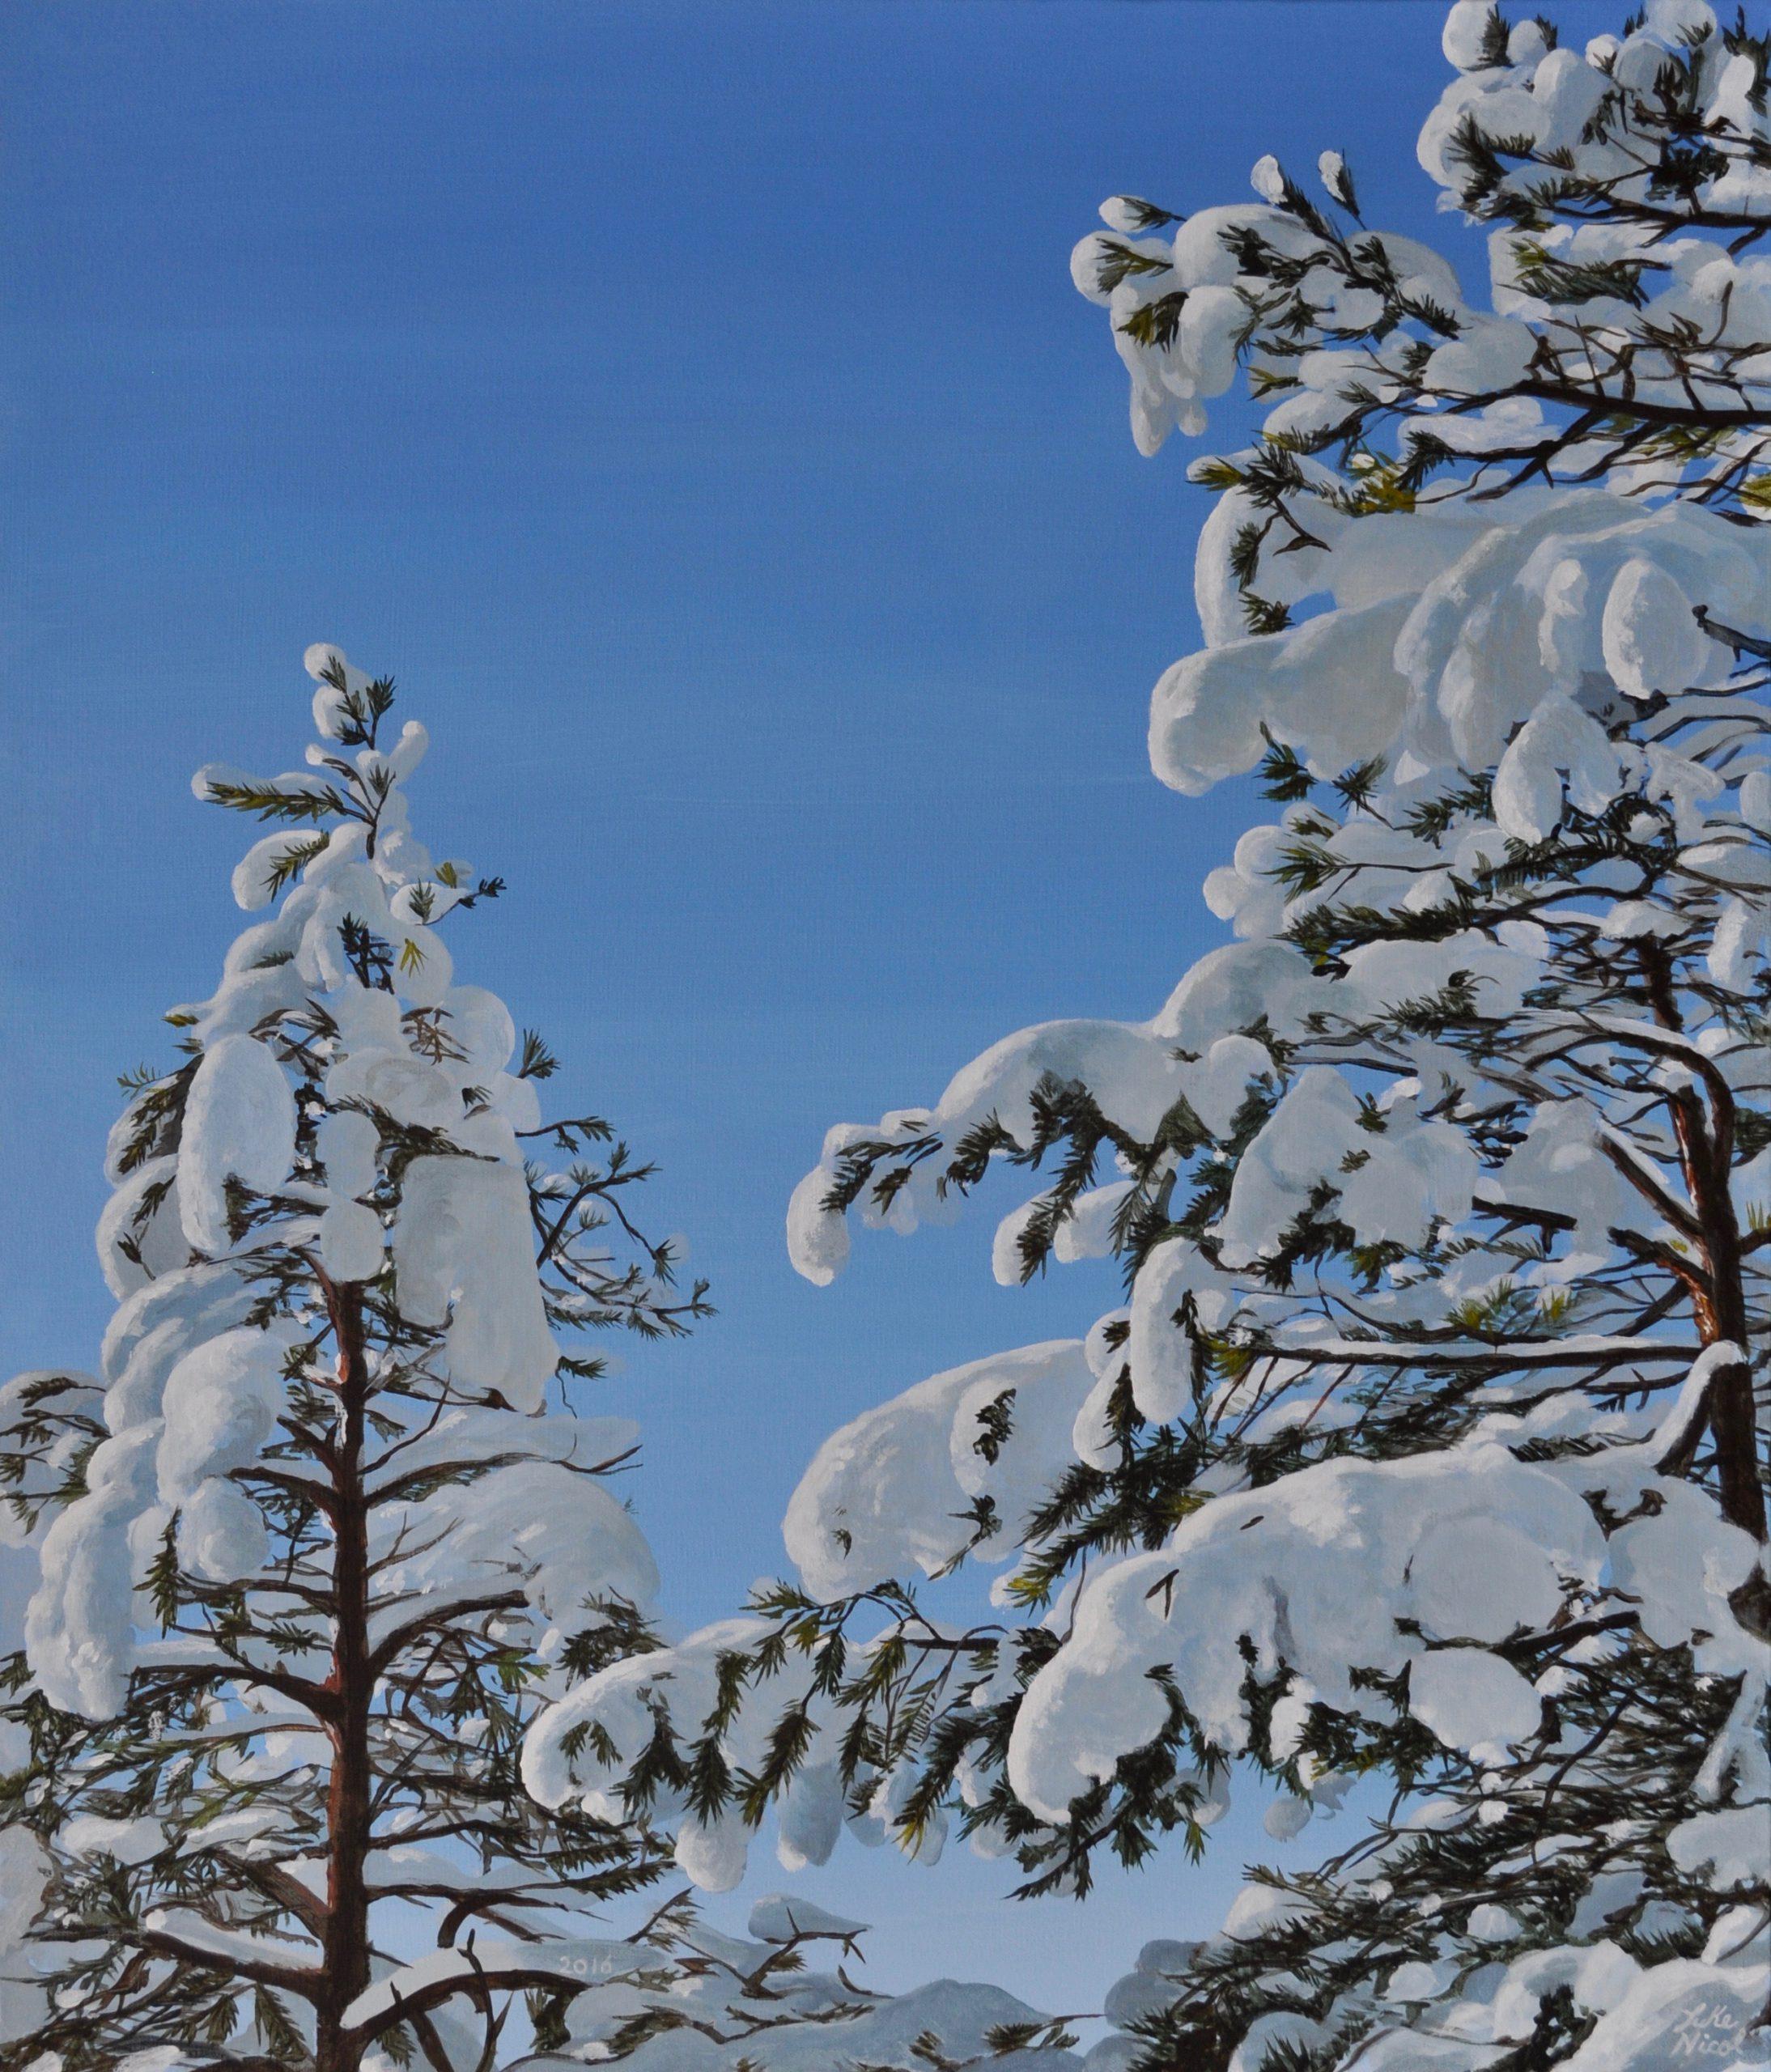 Lumenpeitto 4. Snow Cover.